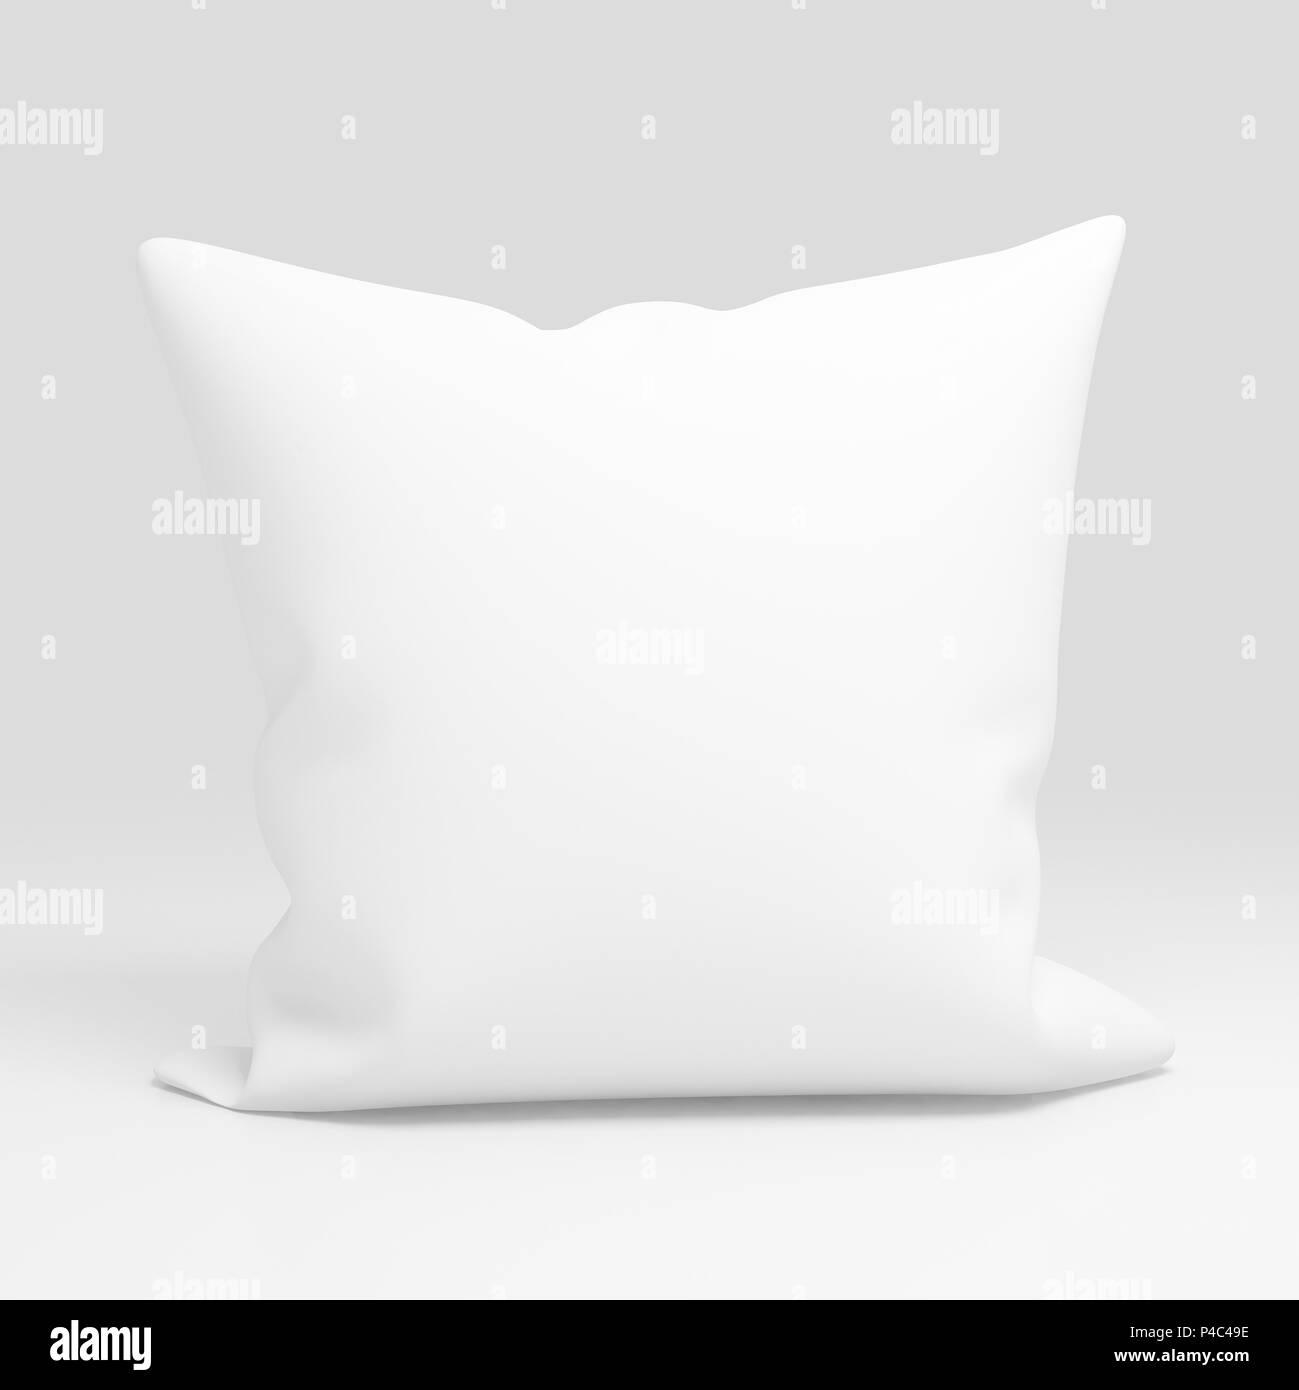 blank white pillow case design mockup isolated 3d illustration